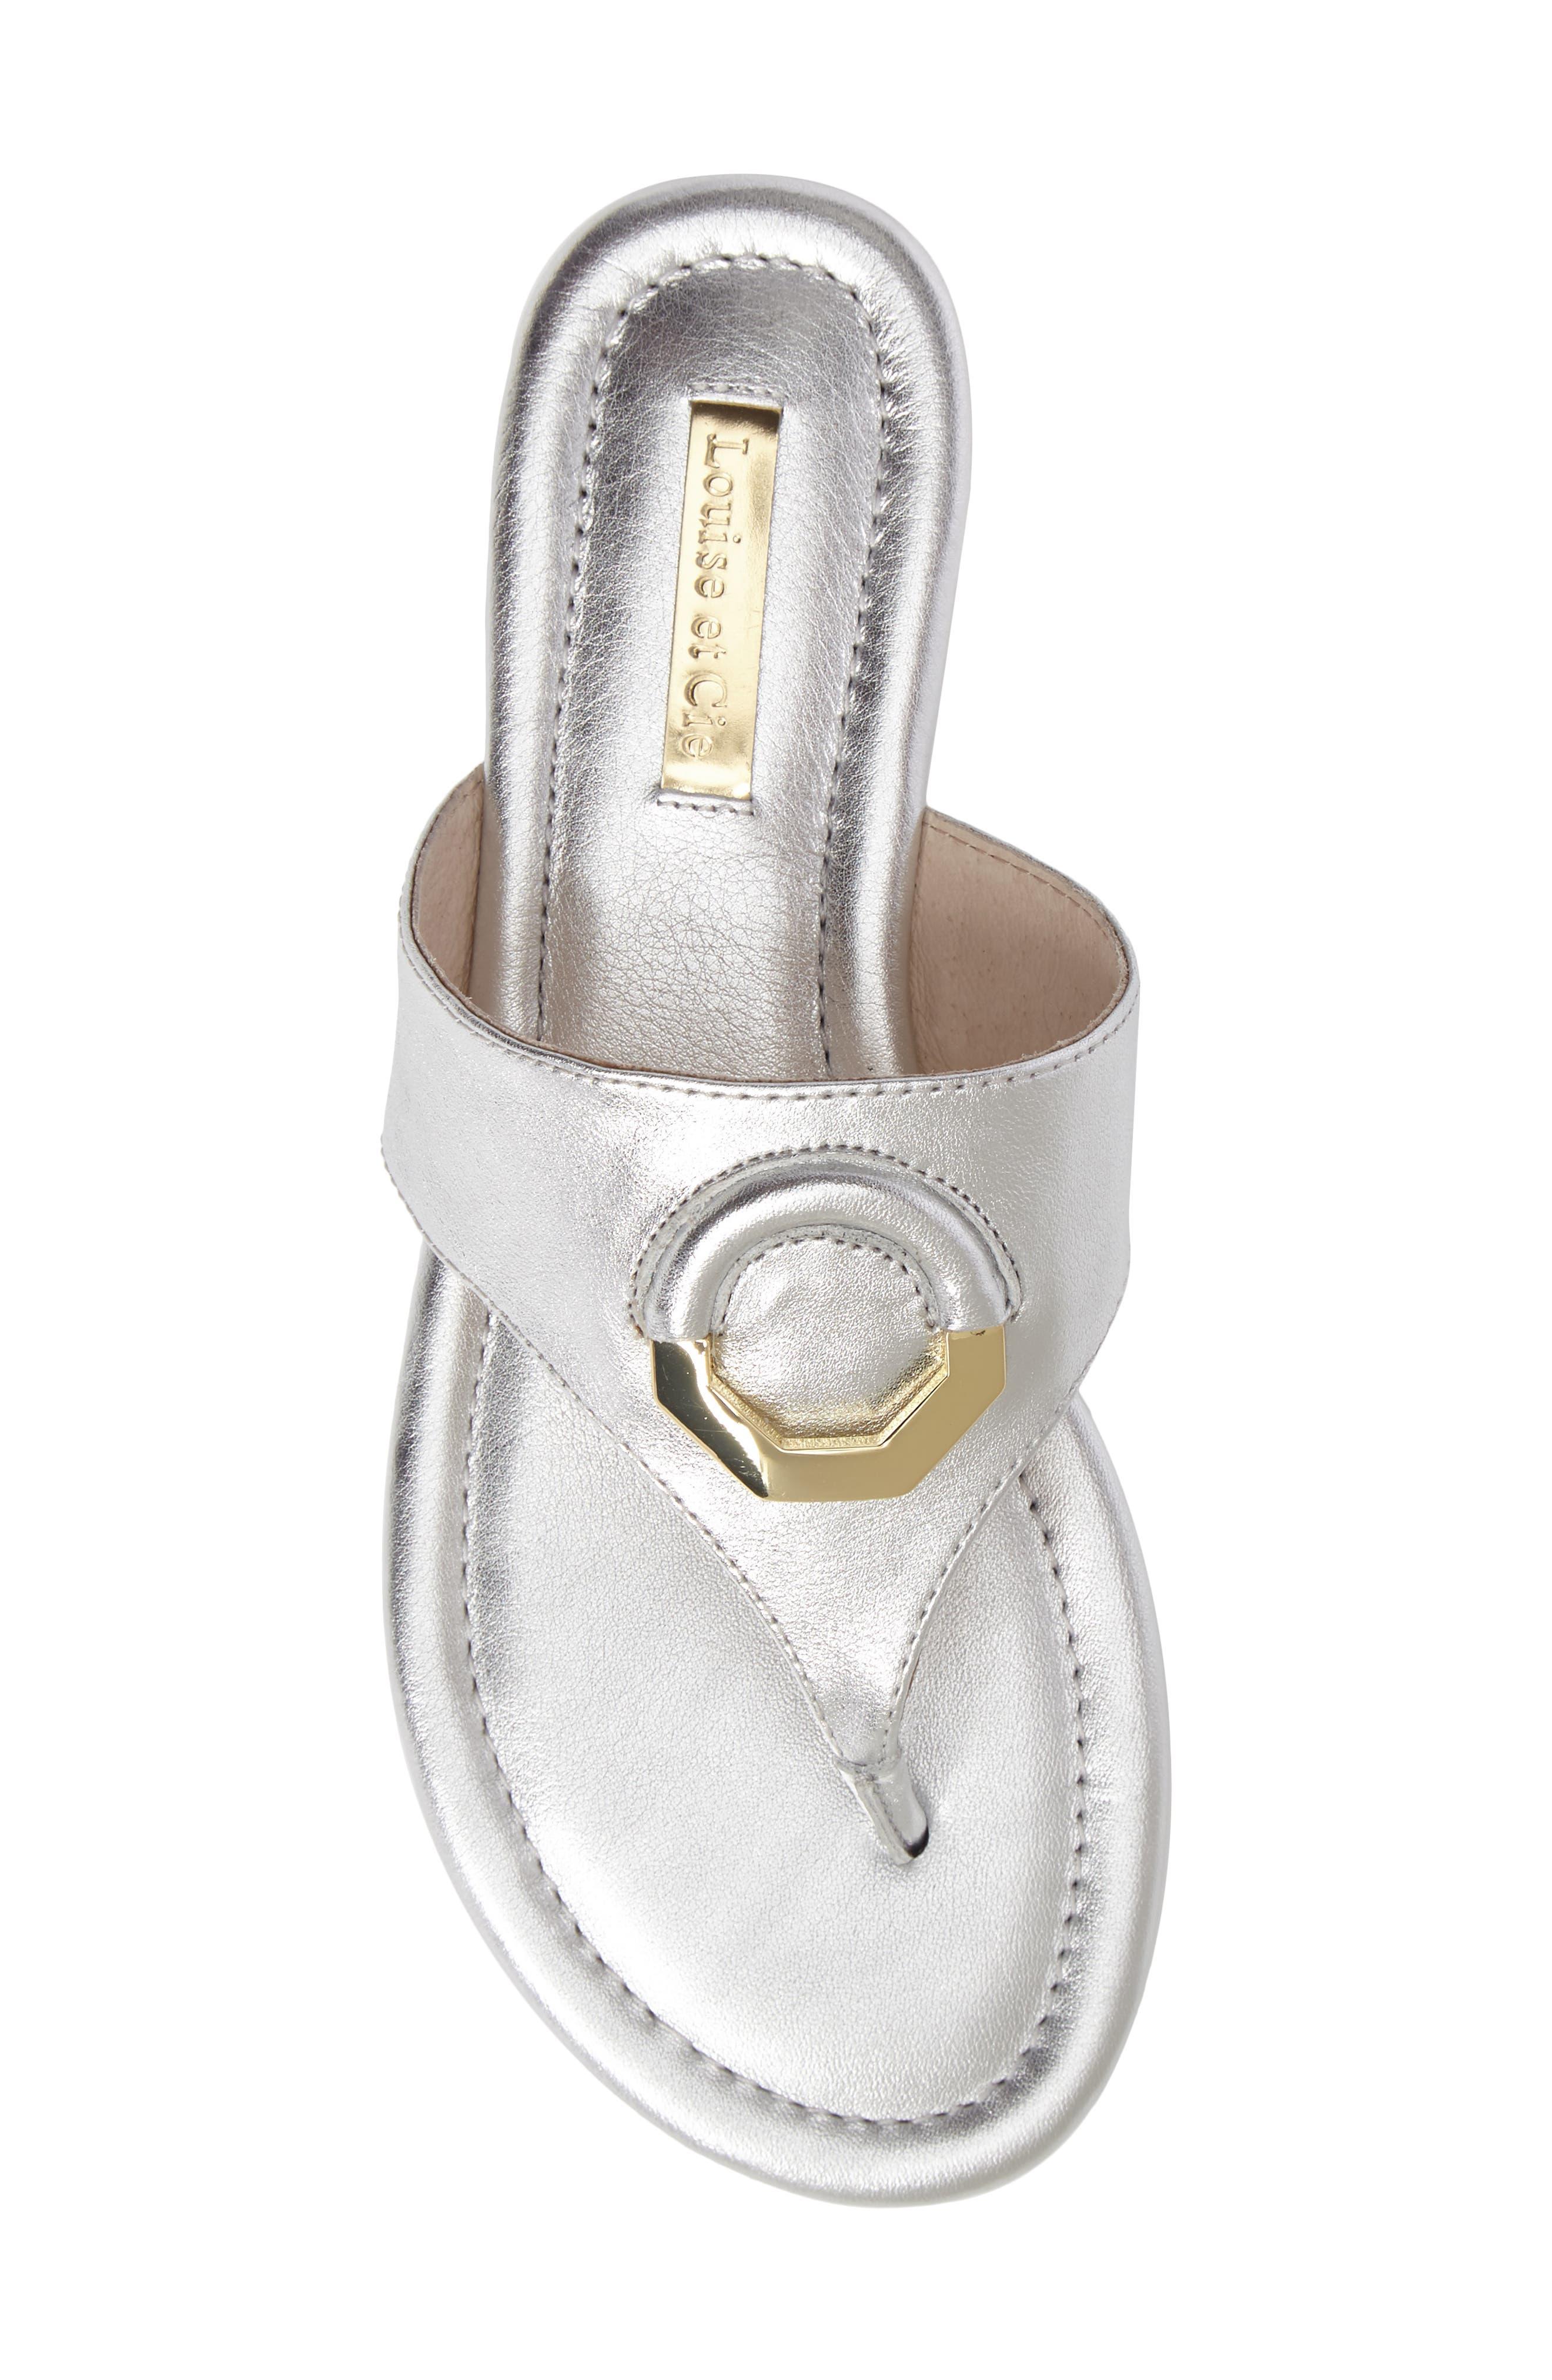 Adana Flip Flop,                             Alternate thumbnail 5, color,                             Sterling Leather